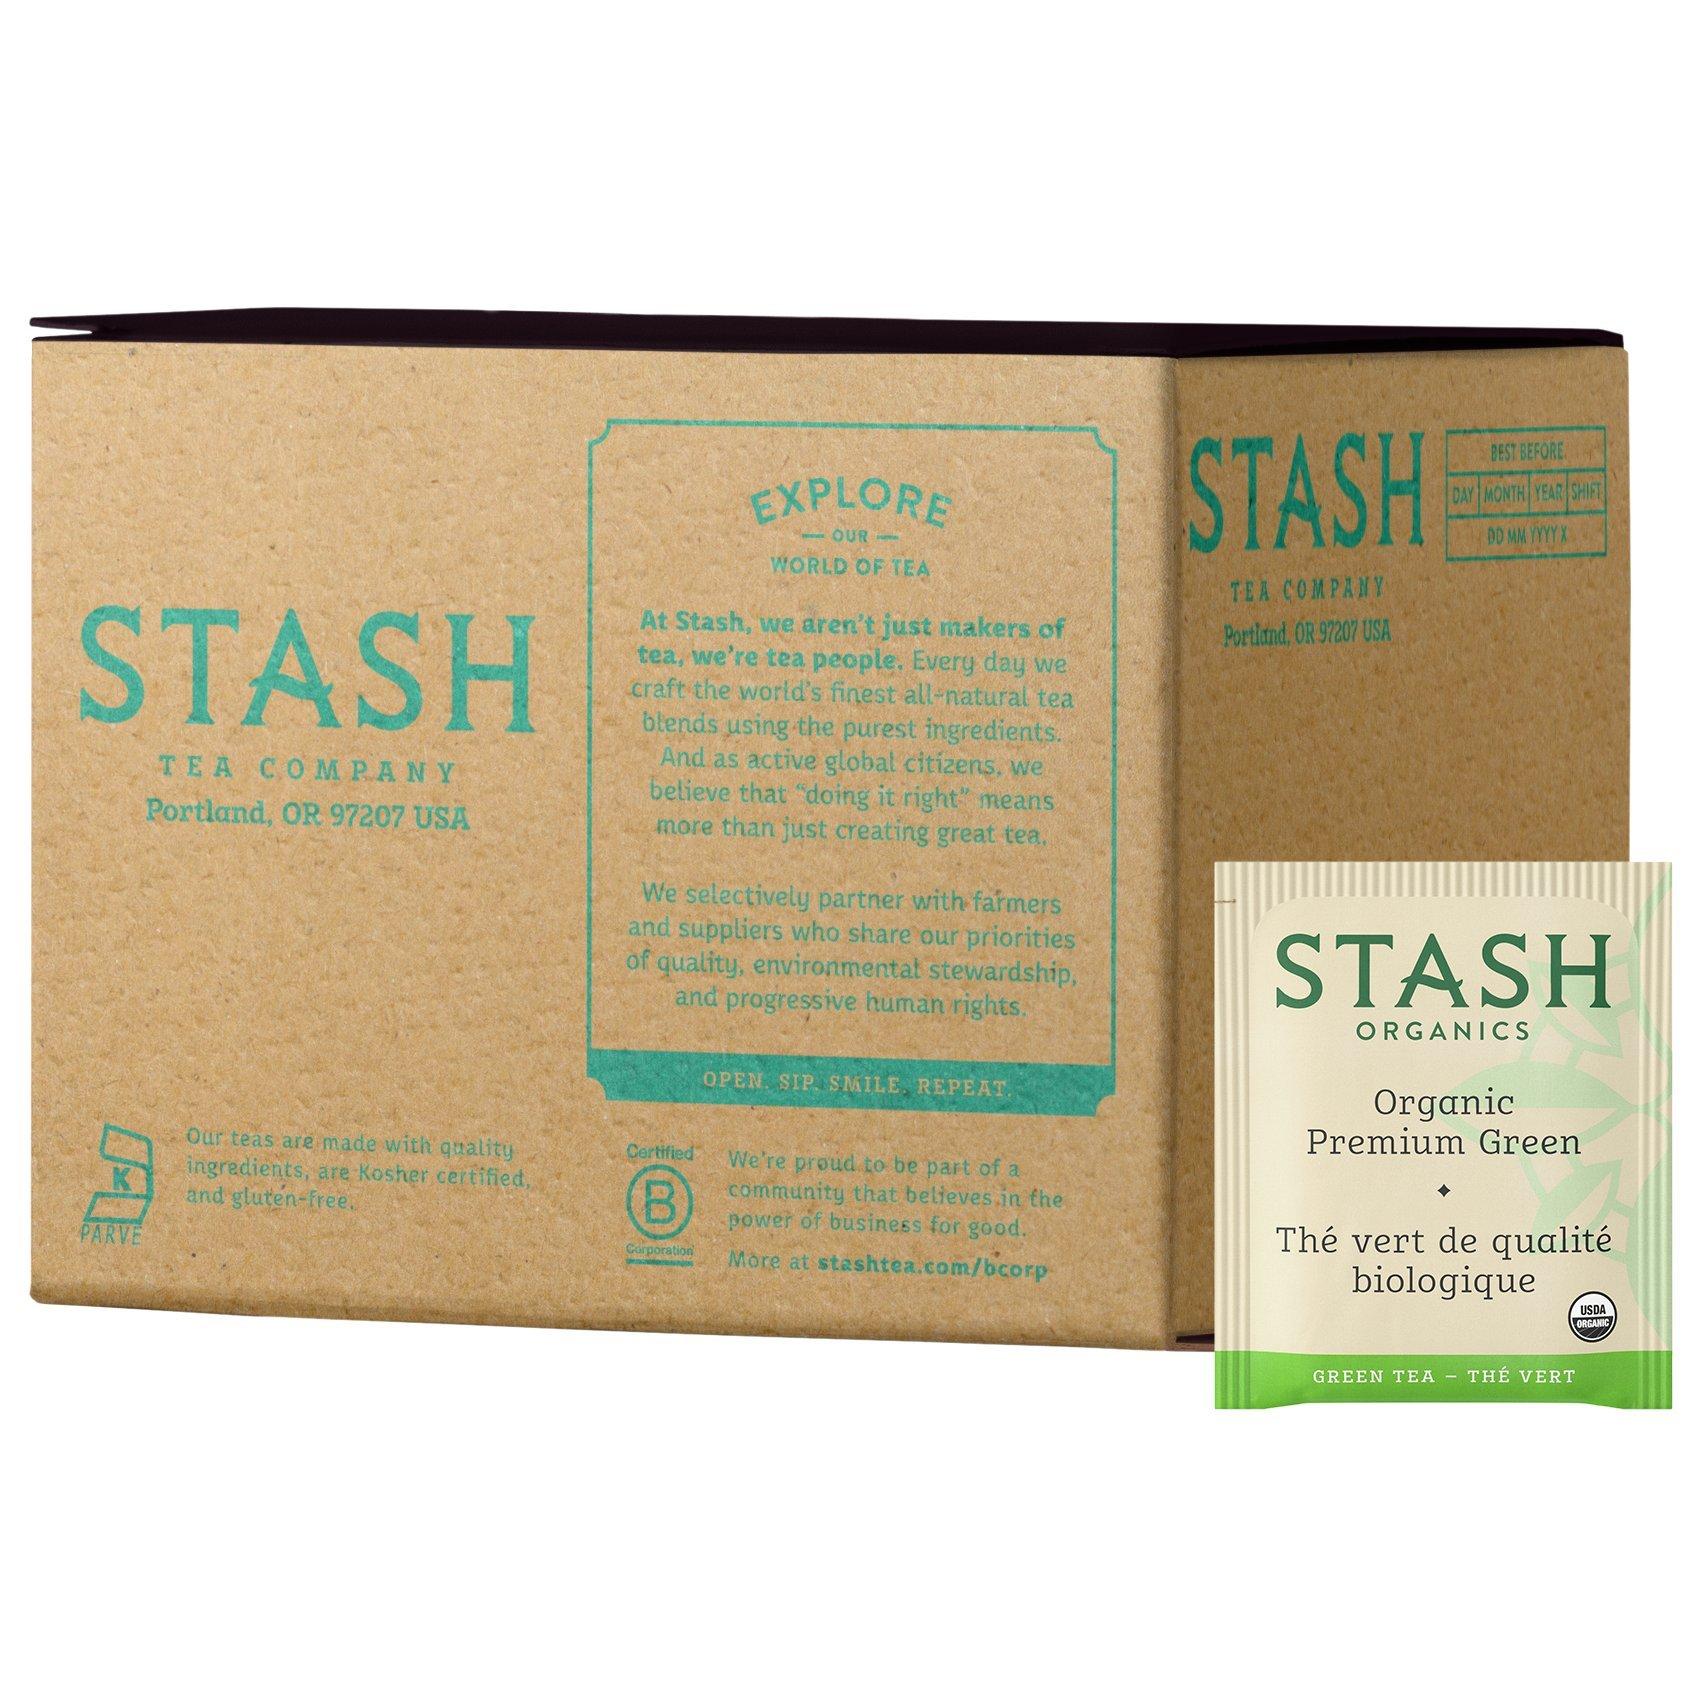 Stash Tea, Organic Premium Green Tea, 100 Count Box of Tea Bags Individually Wrapped in Foil, Medium Caffeine Tea, Japanese Style Green Tea, Hot or Iced